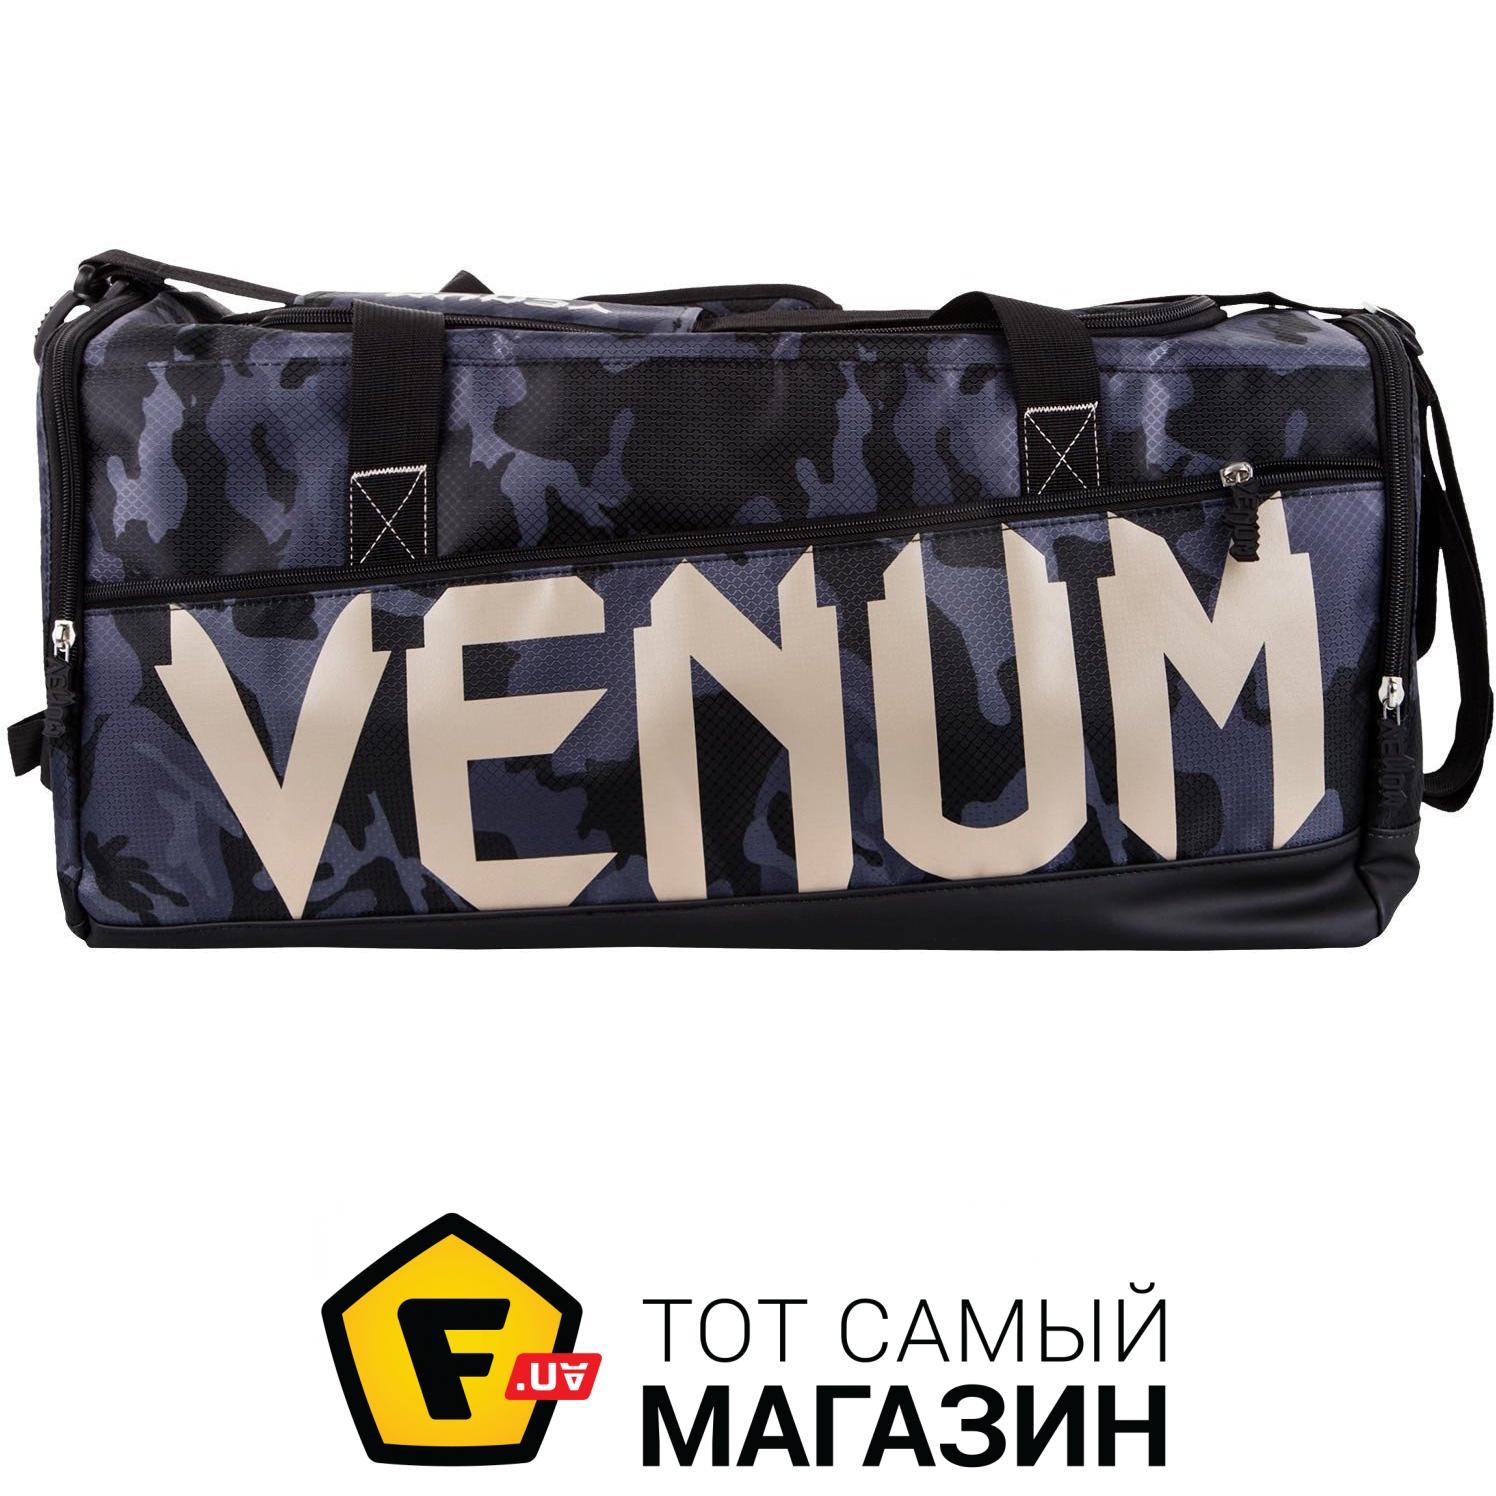 fb0719e06d07 Venum Sparring Sport Bag один размер, камо (02826) Назначение: для бокса,